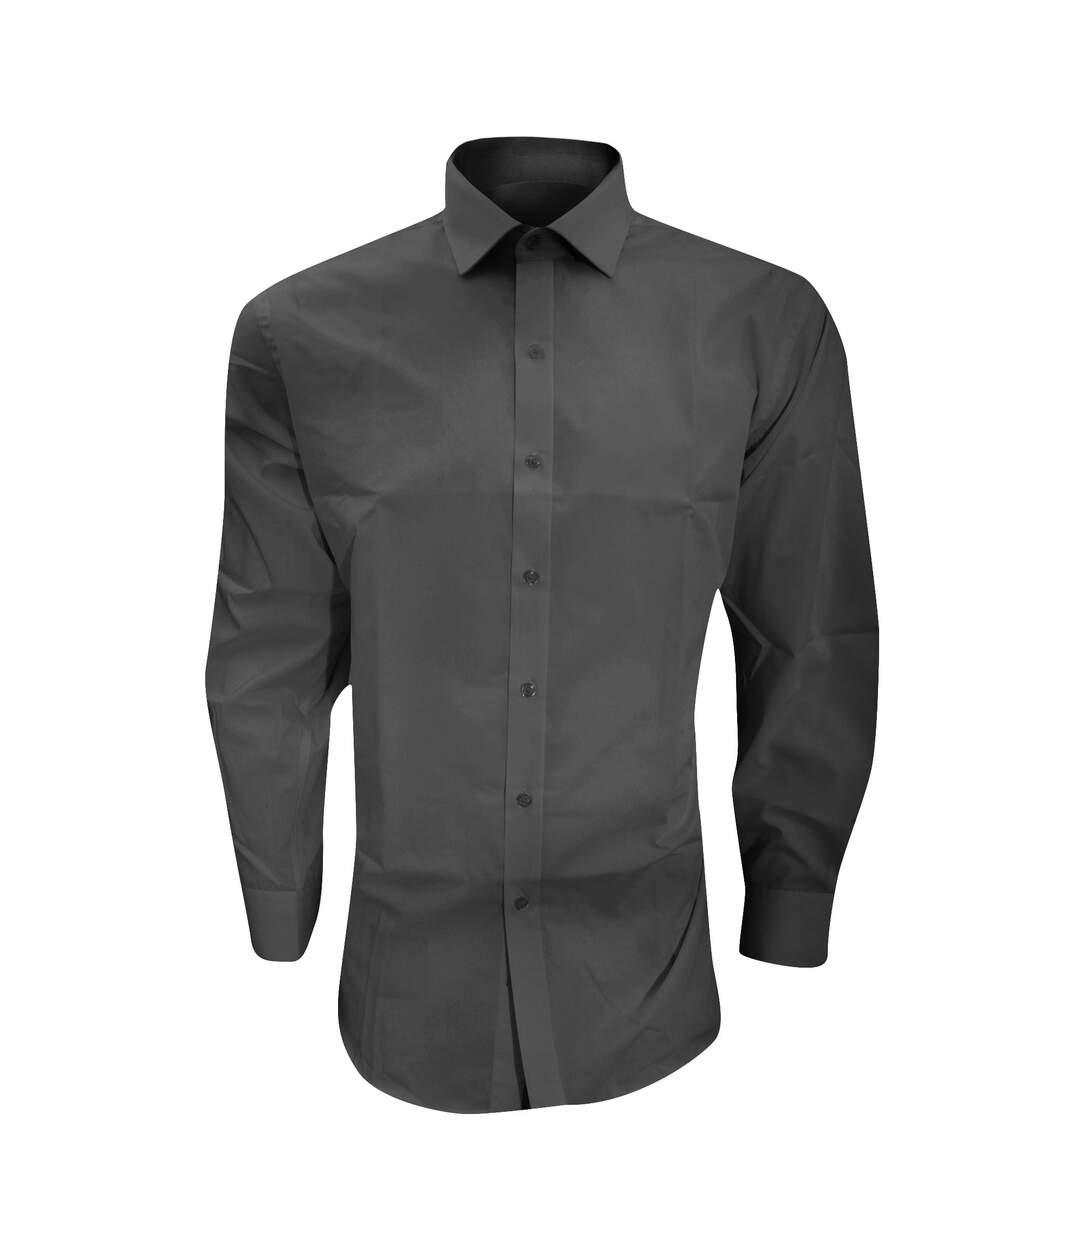 Brook Taverner Mens Alba Slim Fit Long Sleeve Easy Iron Work Shirt (Black) - UTRW2623